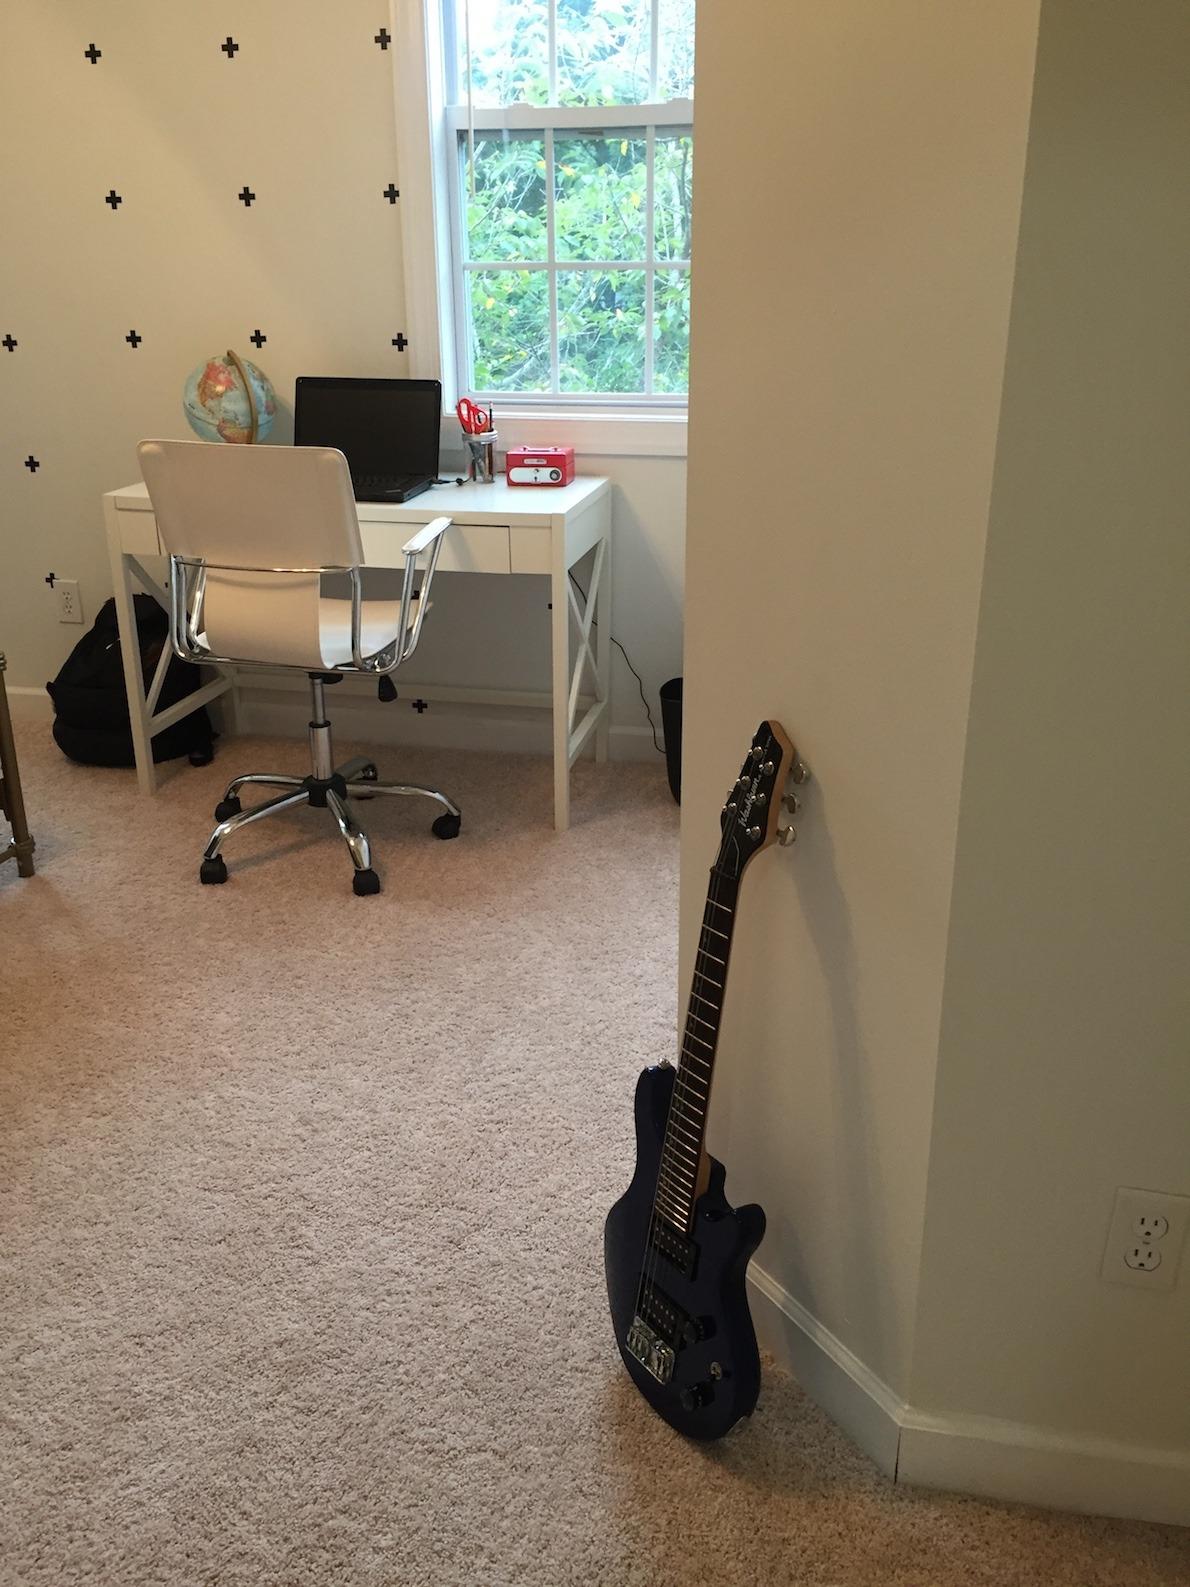 Entrance guitar www.thethreeyearexperiment.com